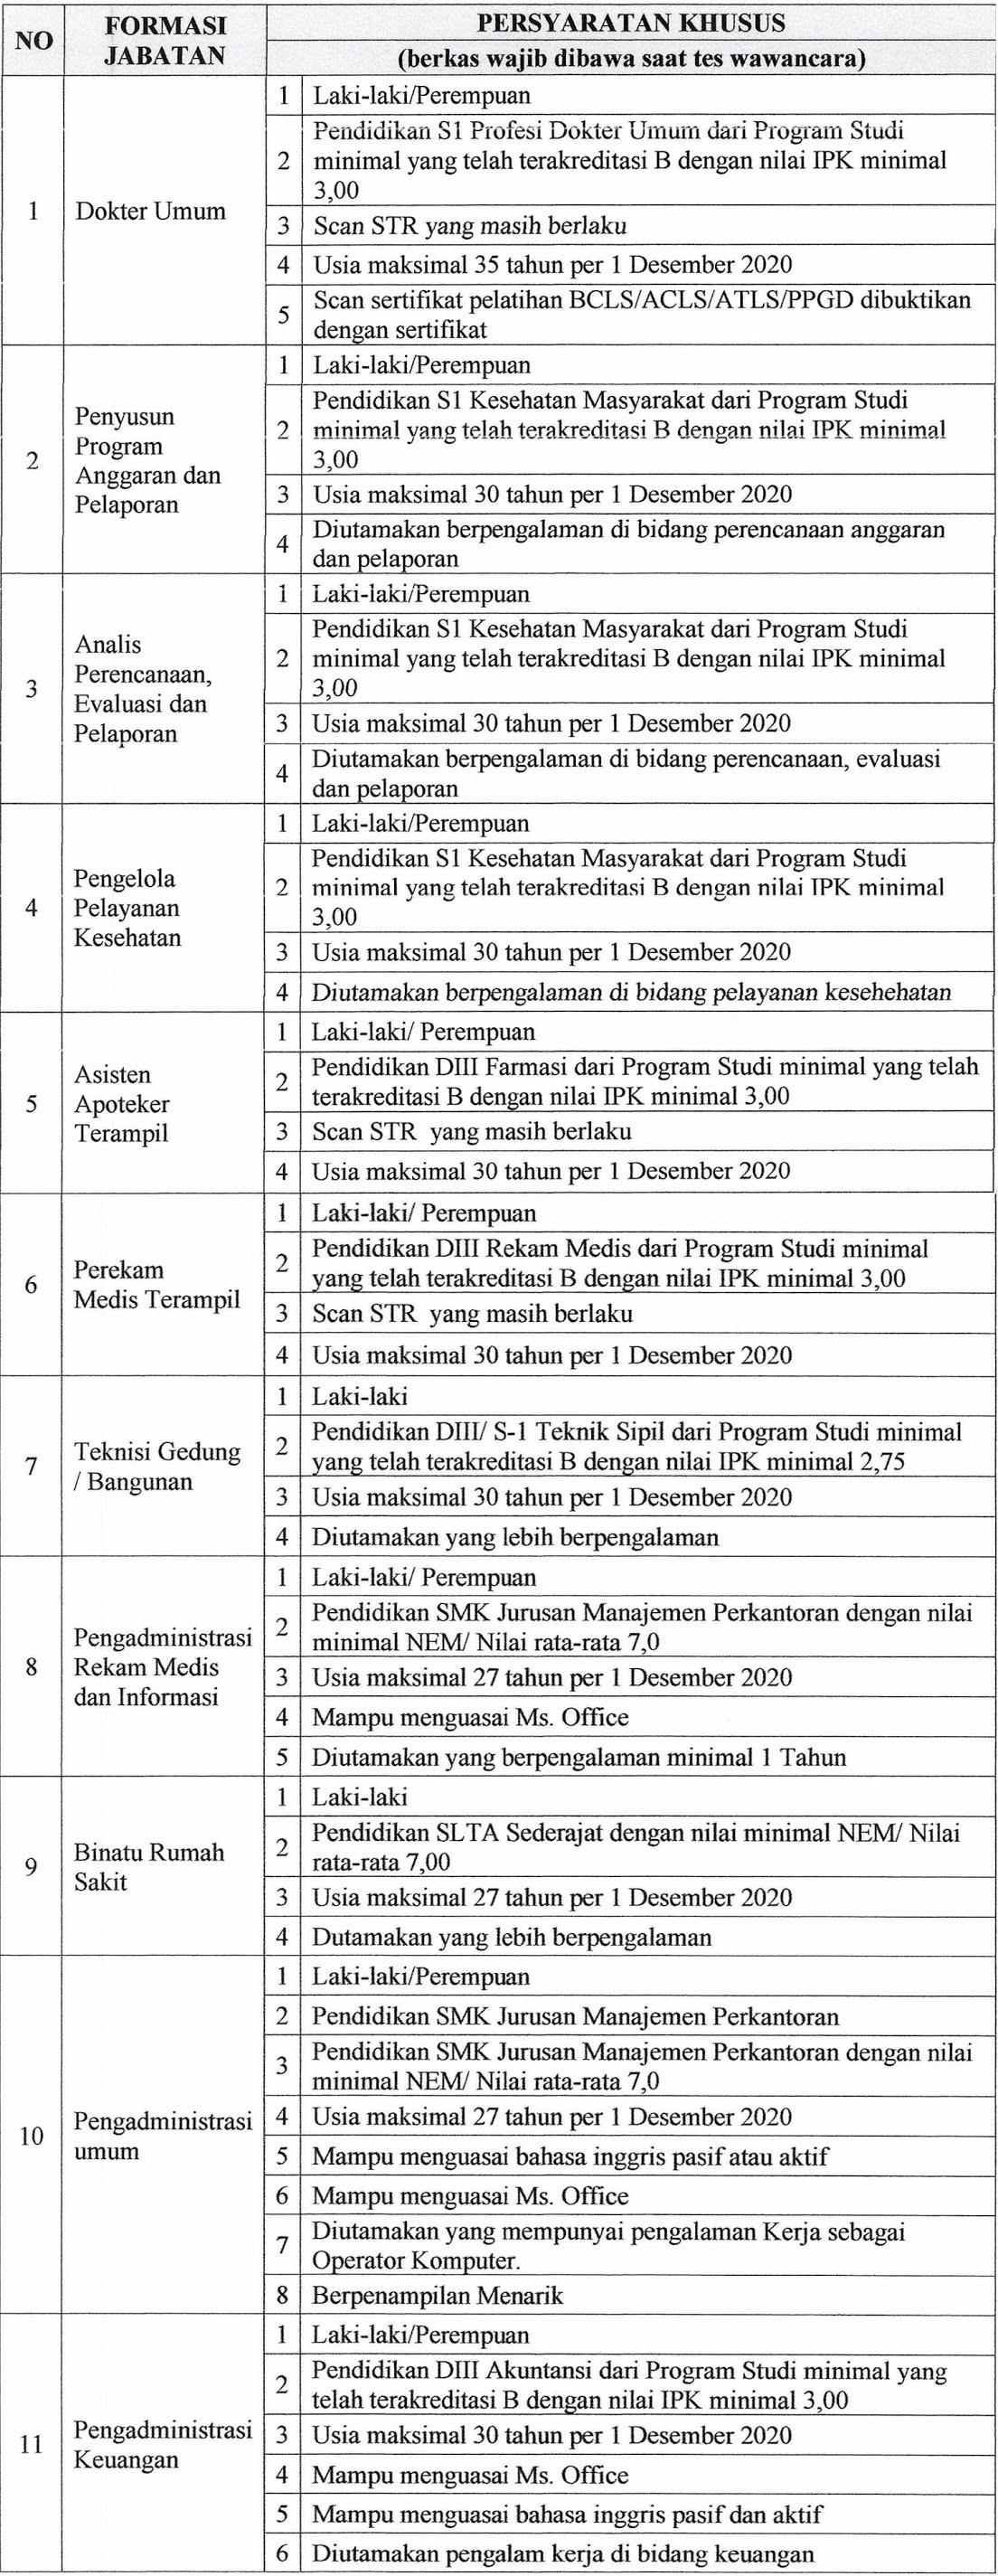 seleksi penerimaan Pegawai Tidak Tetap BLUD Non PNS RSMM Jawa Timur